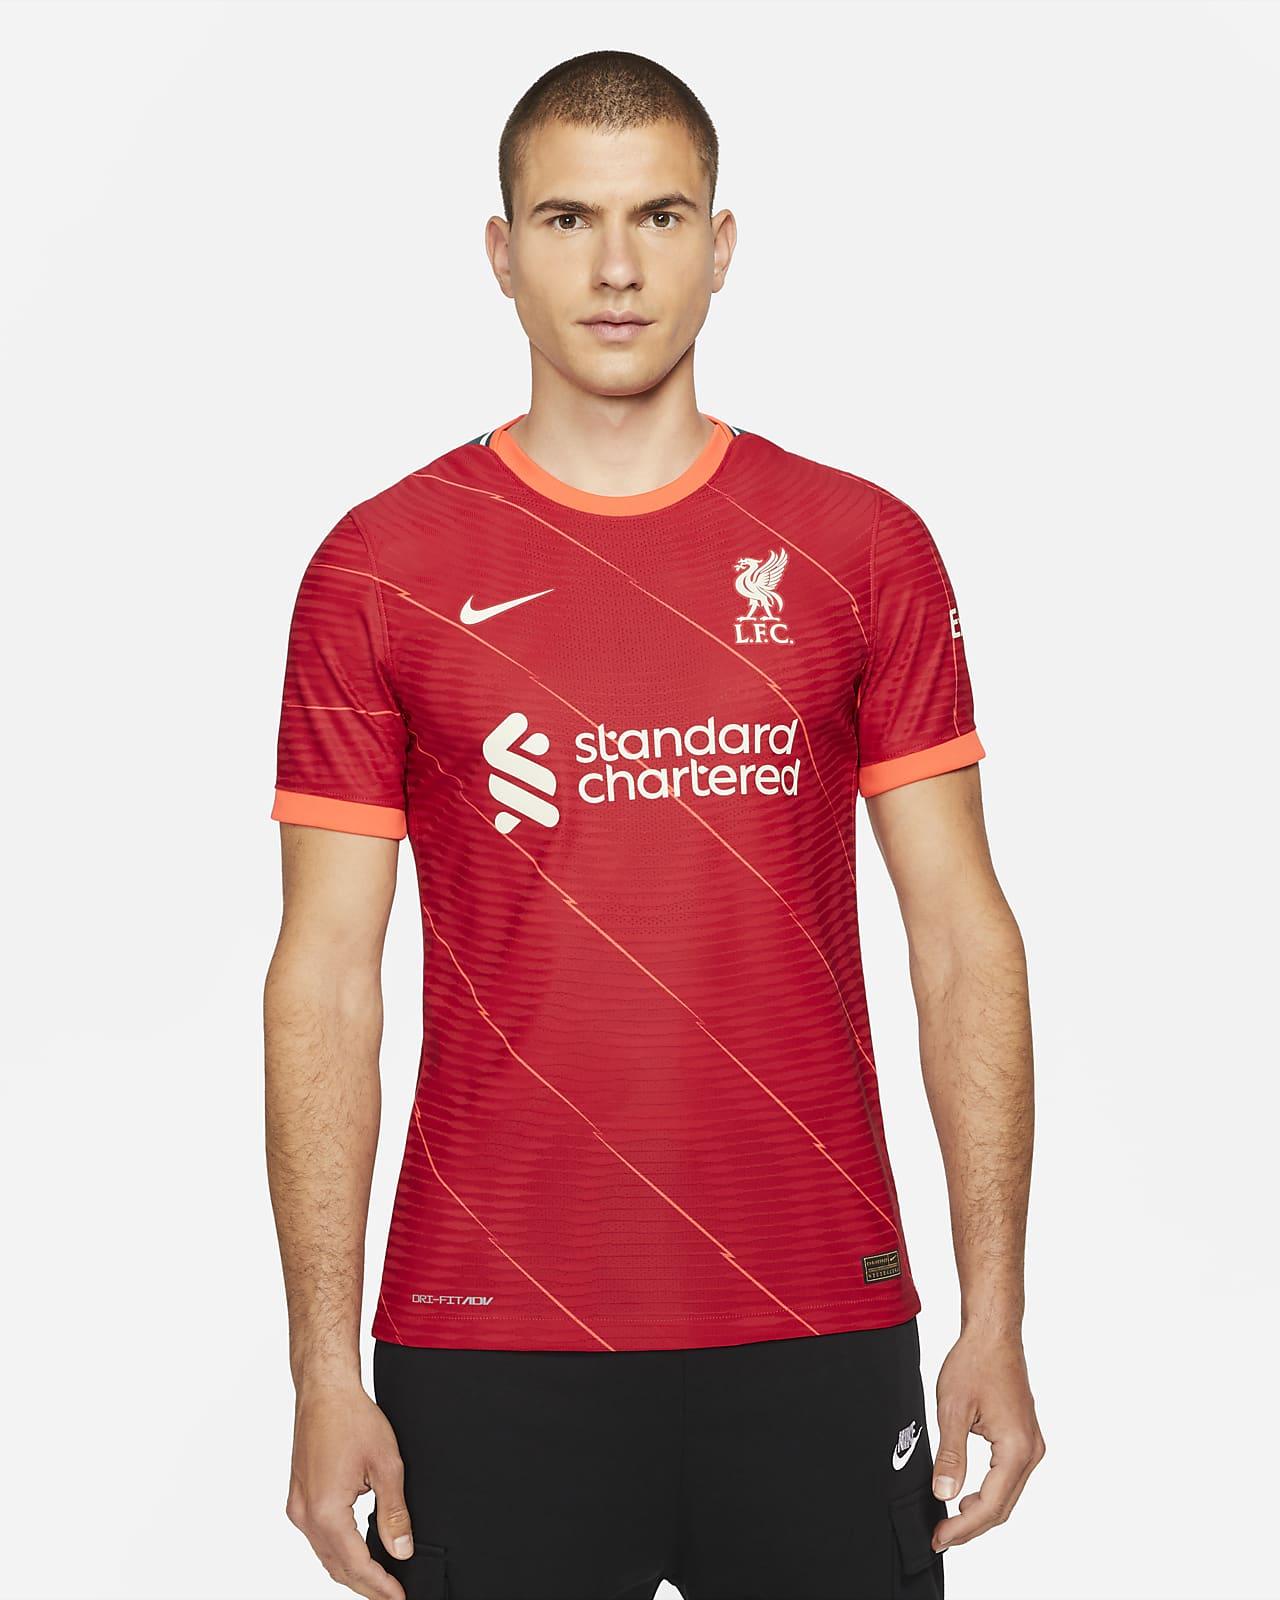 Liverpool FC 2021/22 Match Home Nike Dri-FIT ADV Fußballtrikot für Herren